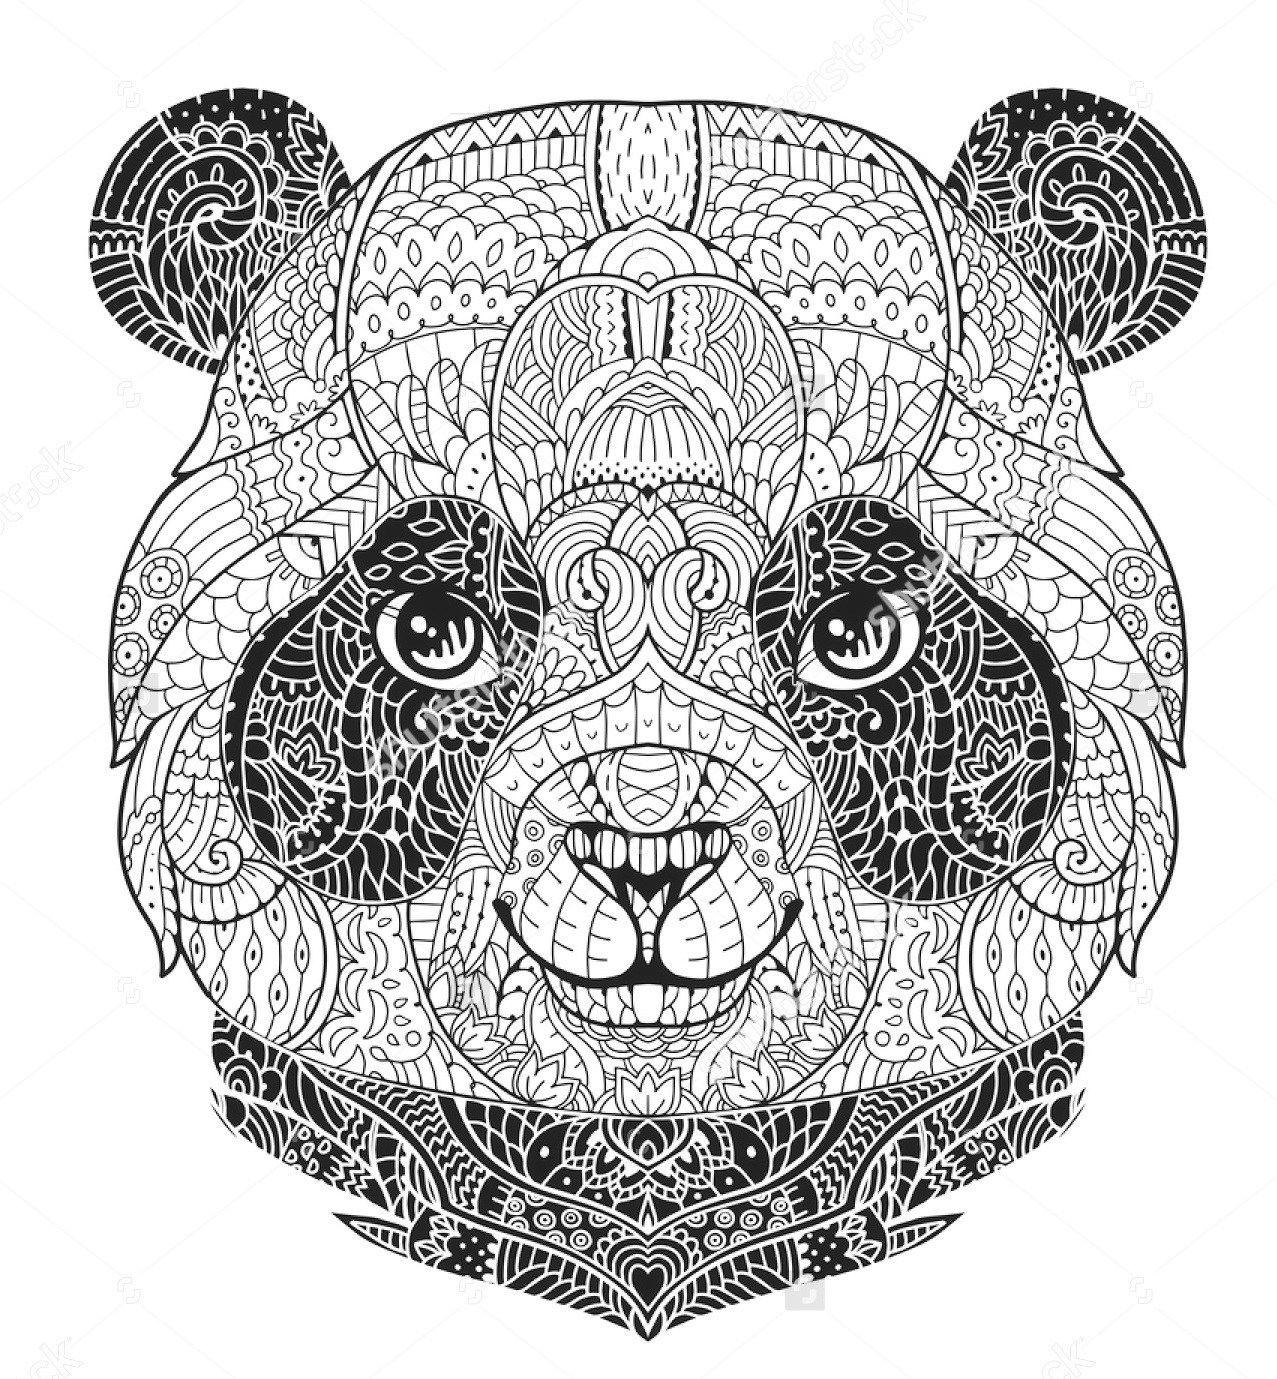 Pandas to color for kids - Pandas Kids Coloring Pages | 1379x1277